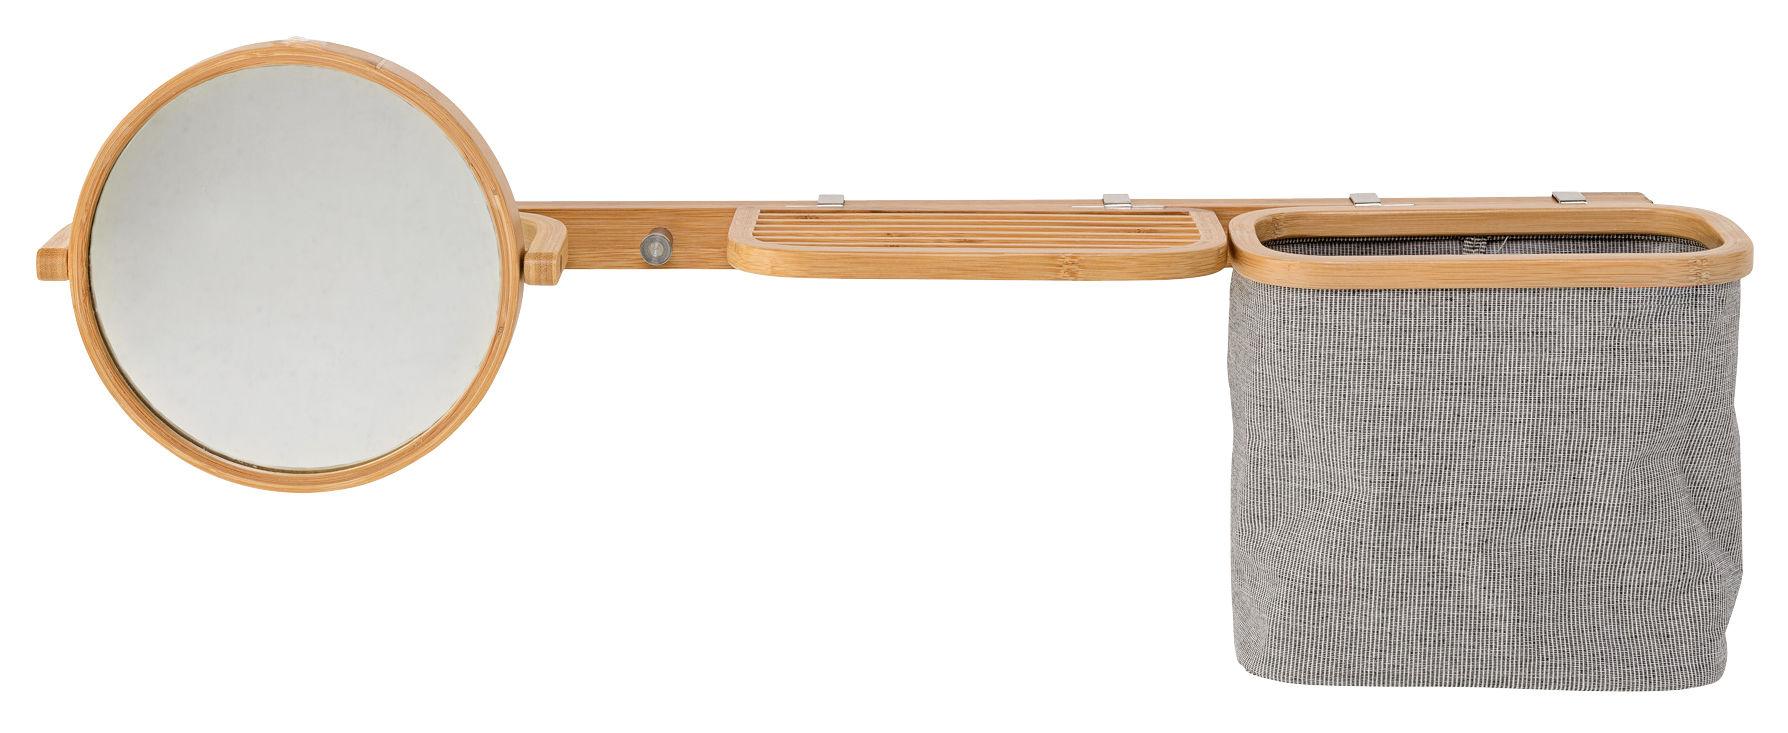 Rangement mural bamboo avec miroir l 70 cm bambou for Alessi porte listino prezzi